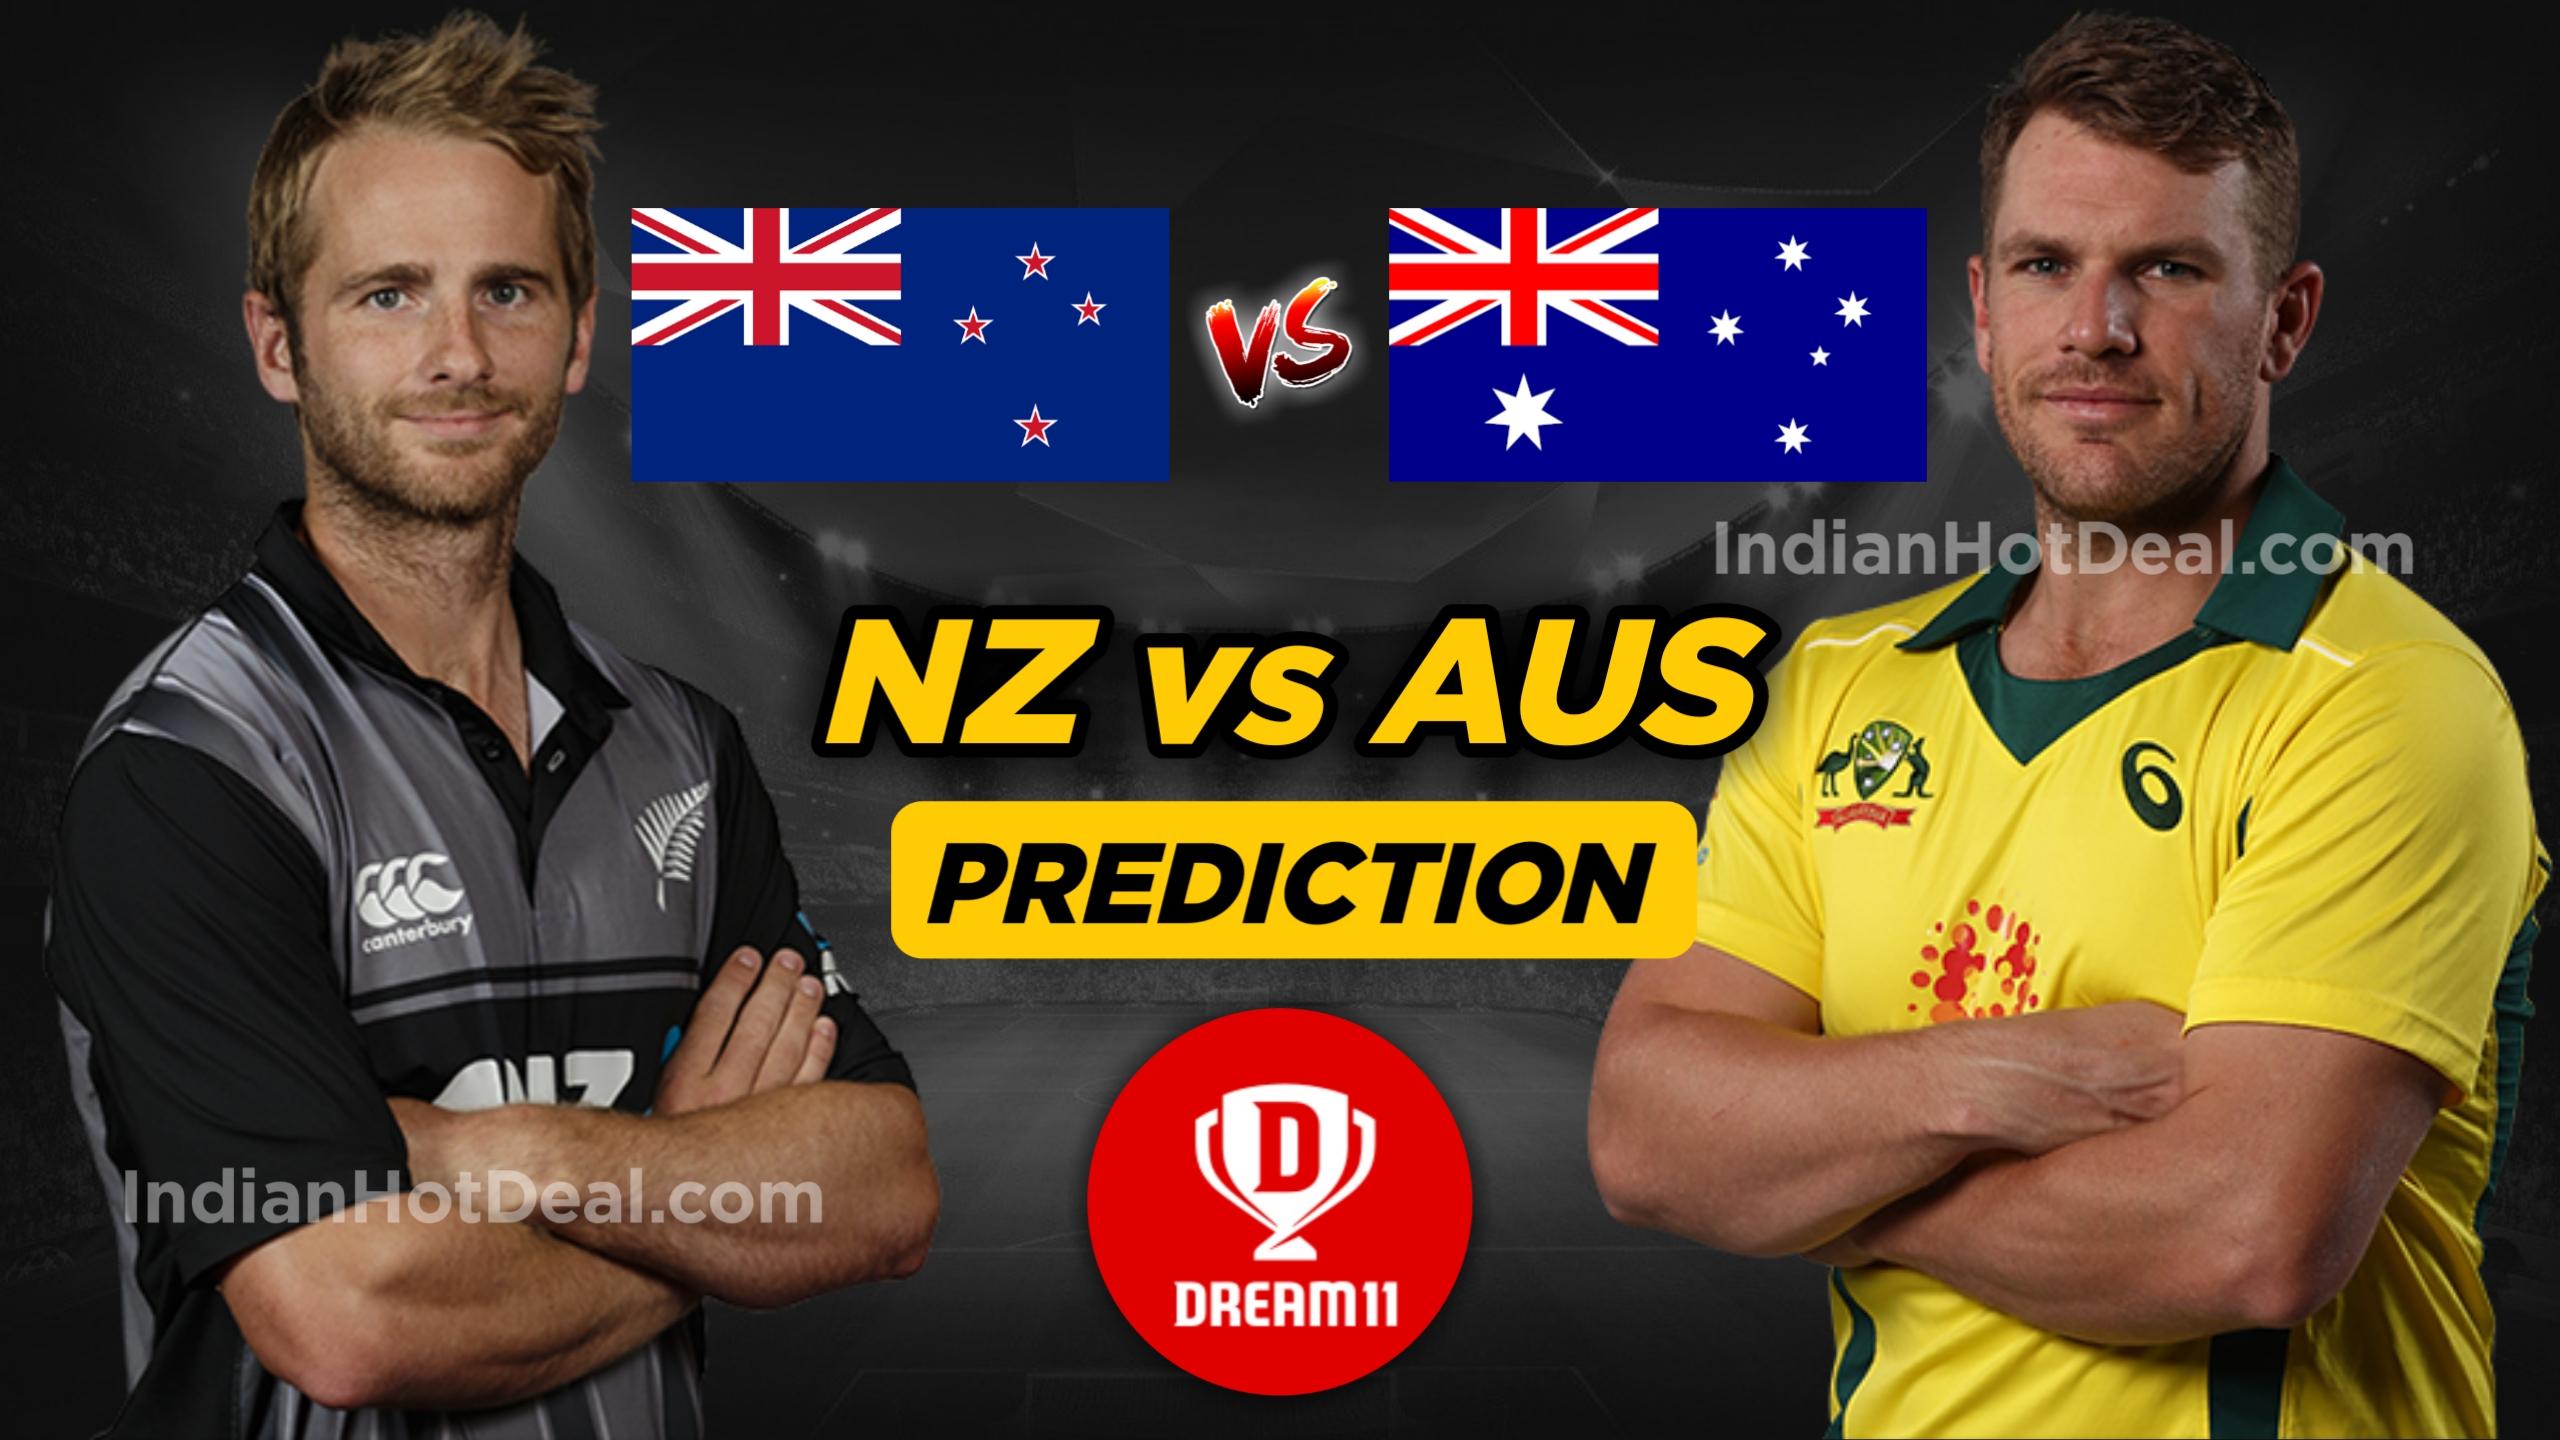 AUS vs NZ 3rd Test Dream11 Team Prediction Today